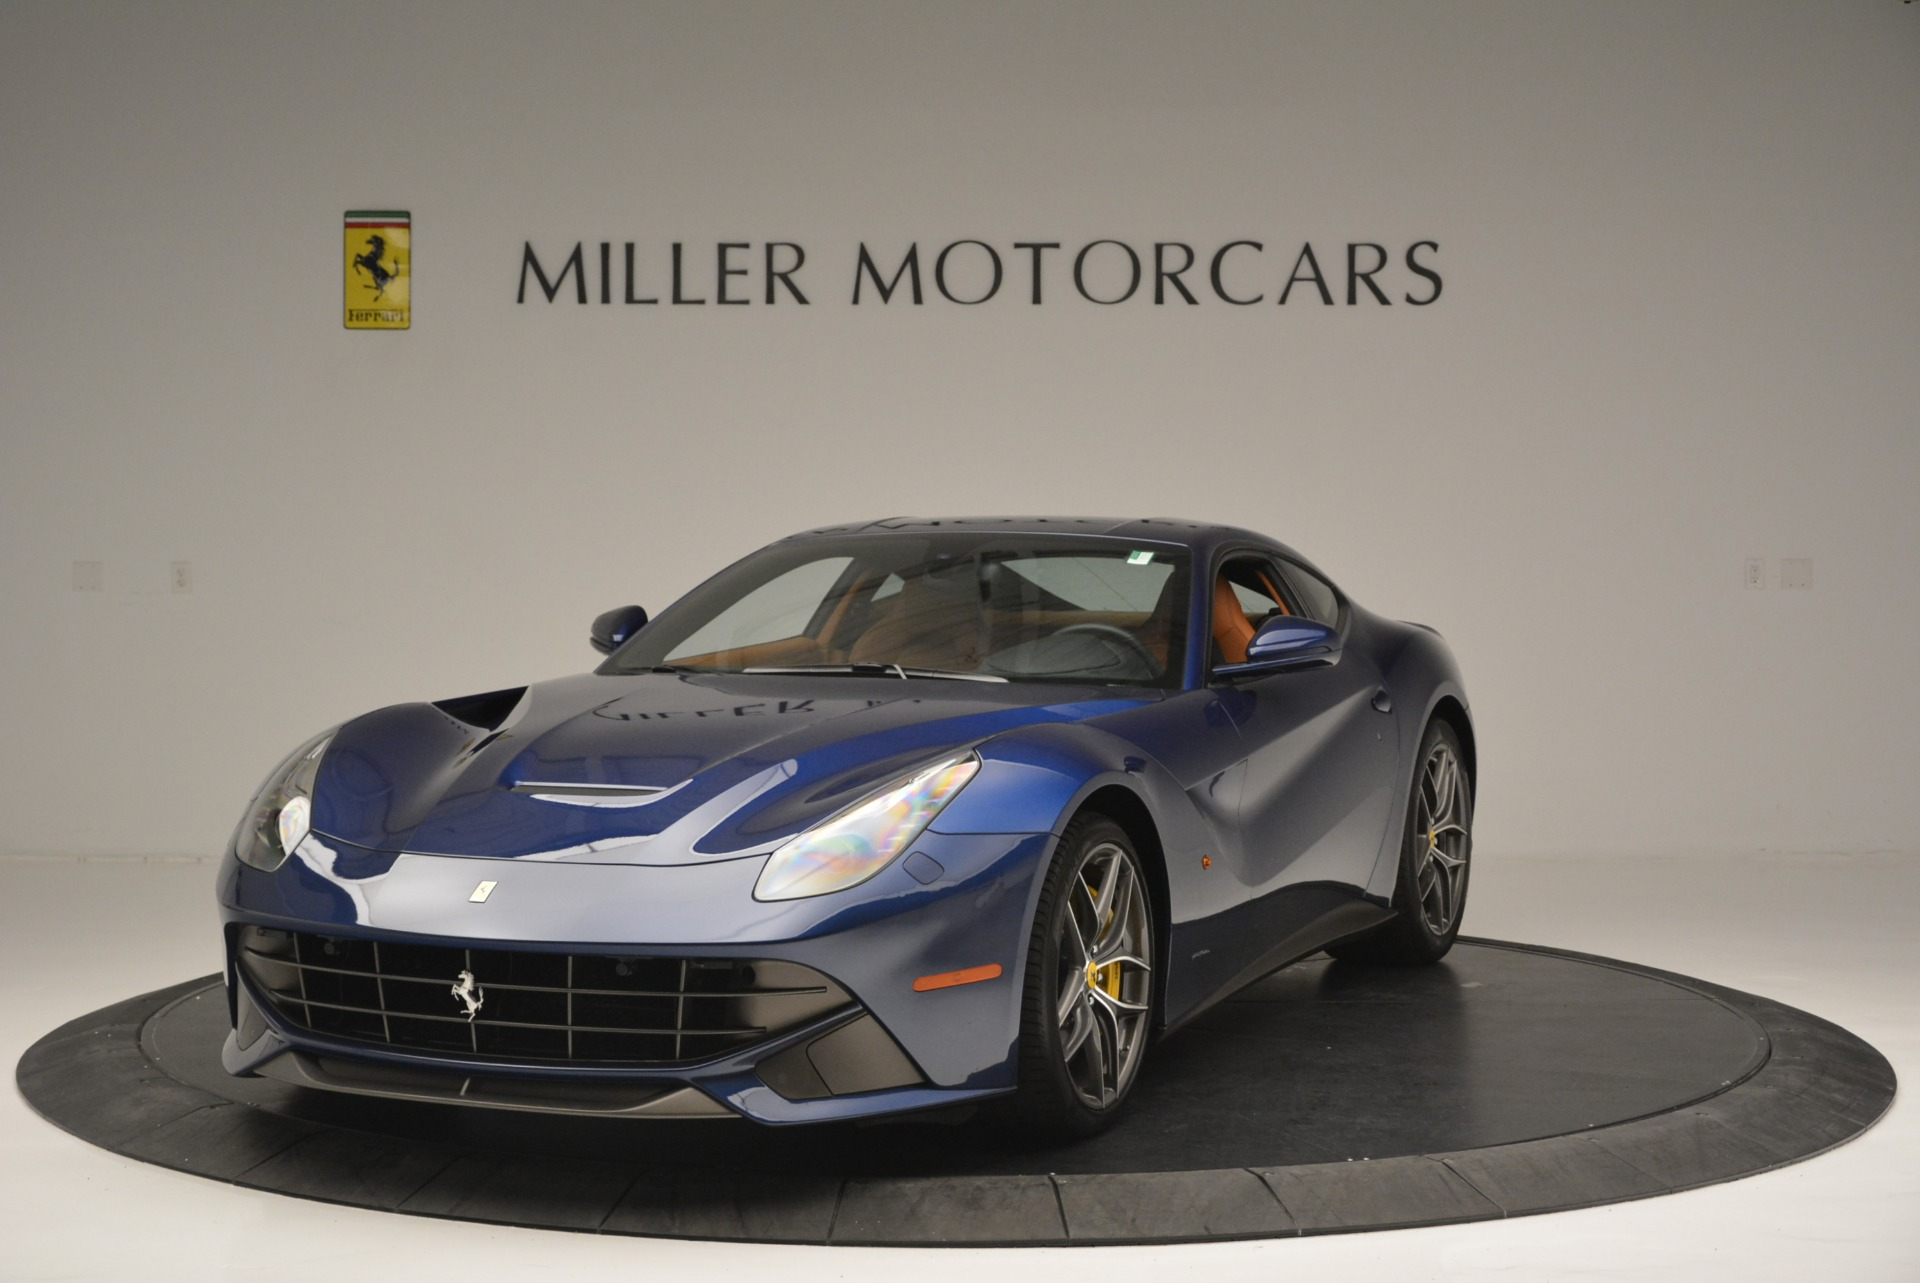 Used 2014 Ferrari F12 Berlinetta for sale Sold at Pagani of Greenwich in Greenwich CT 06830 1